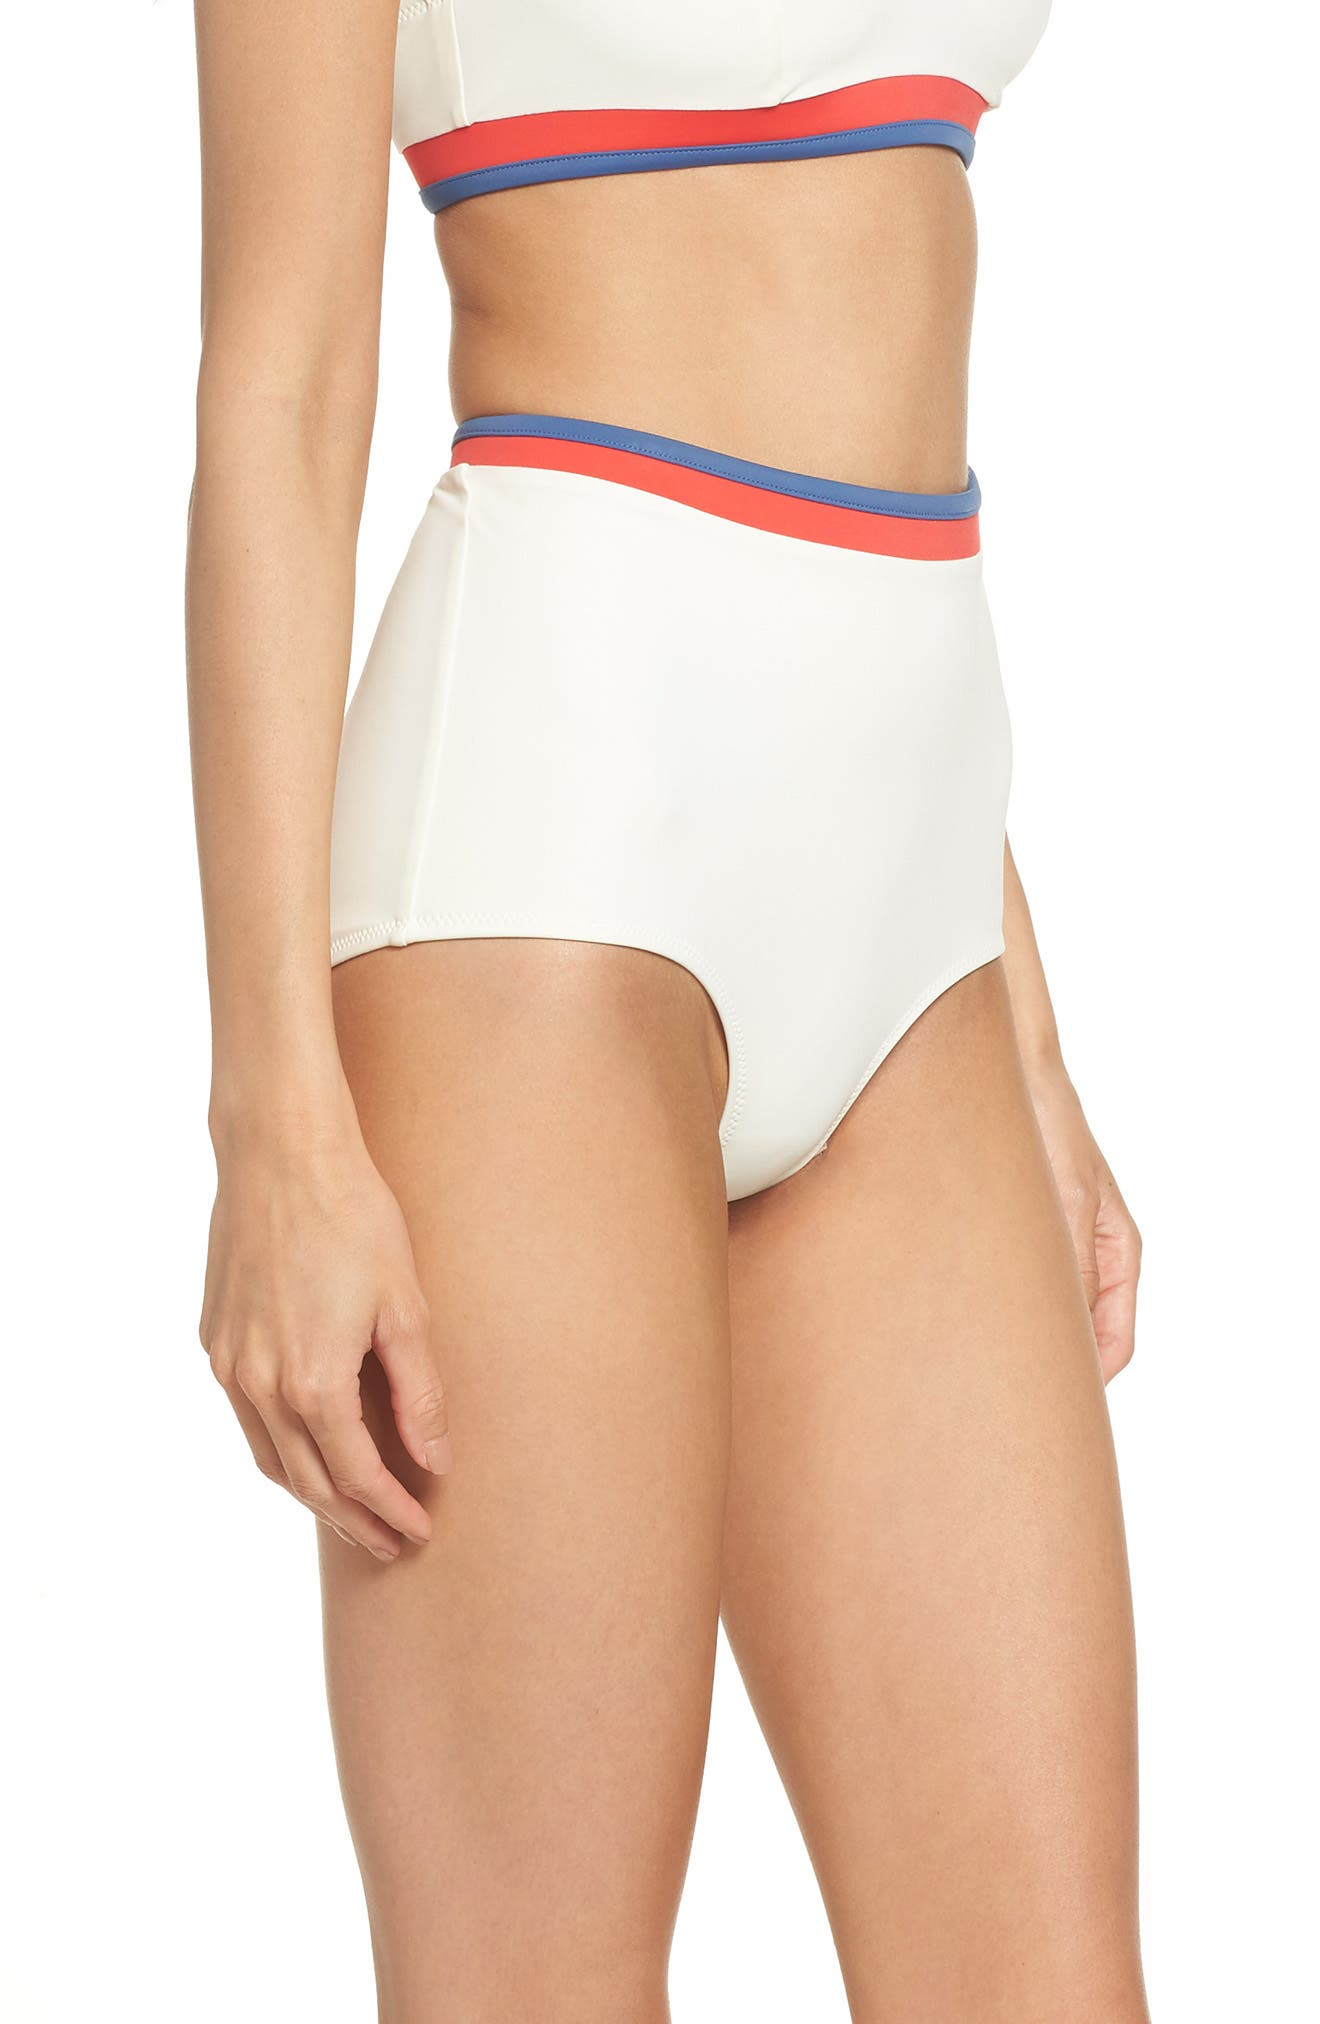 Solid & Stripe Katie High Waist Bikini Bottoms,                             Alternate thumbnail 3, color,                             900